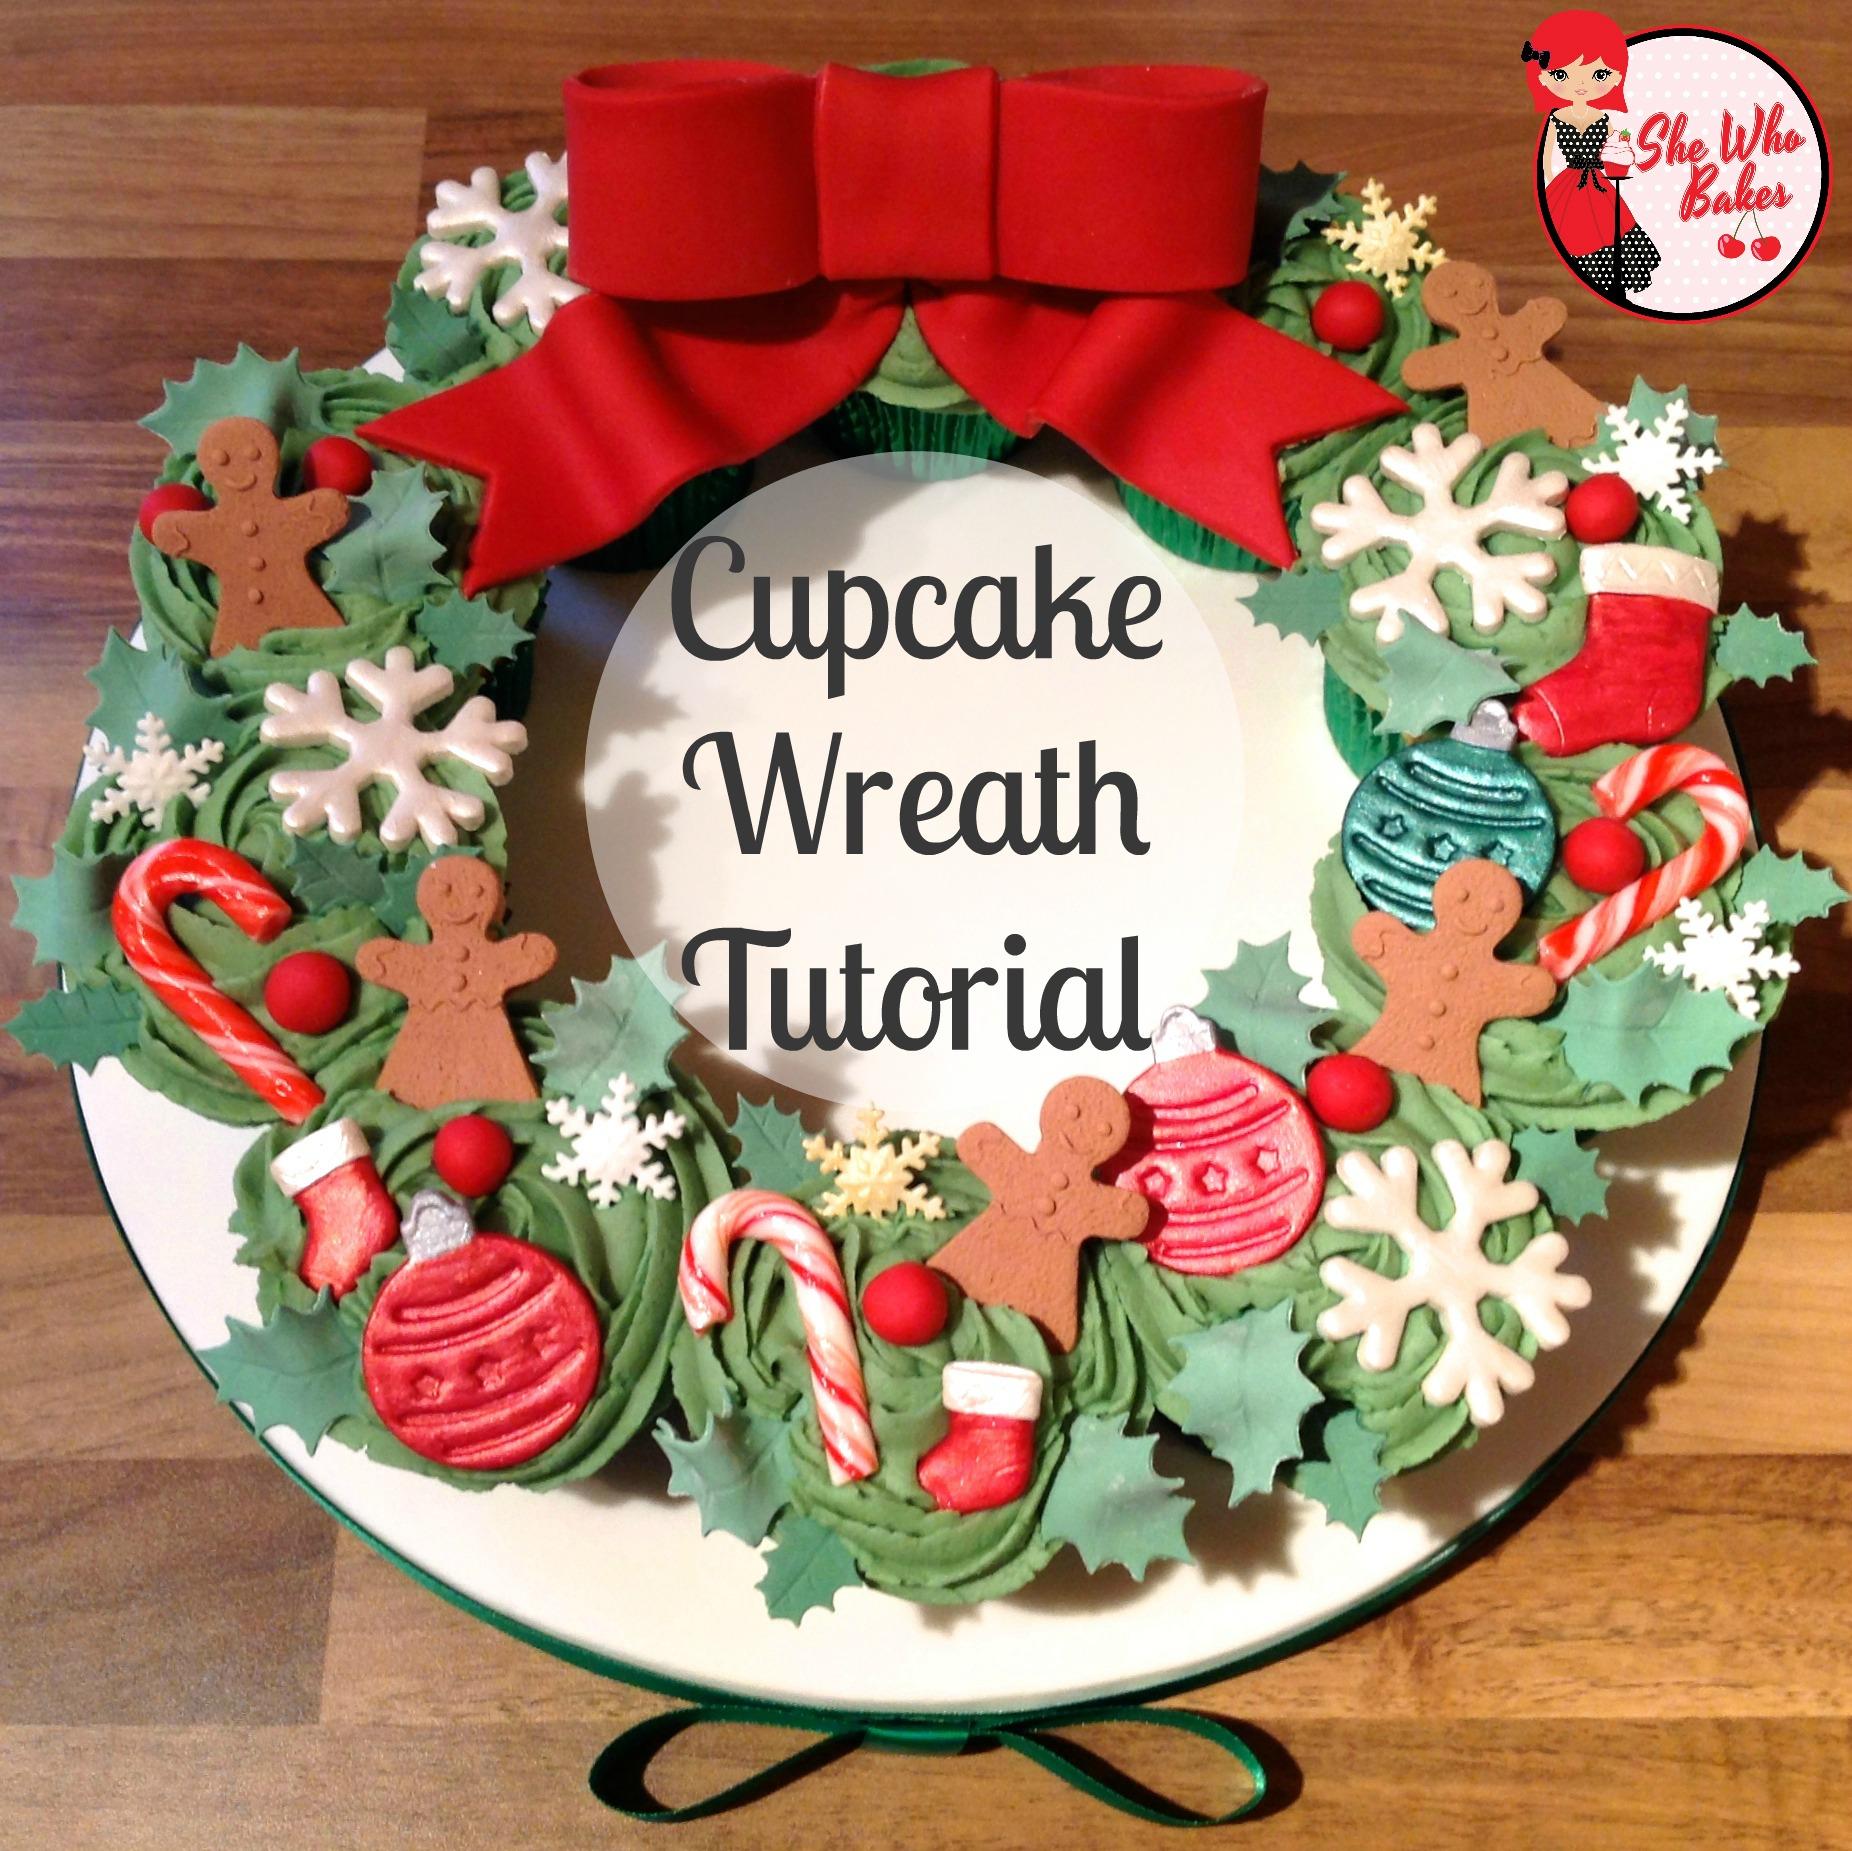 Cupcake Wreath Tutorial She Who Bakes